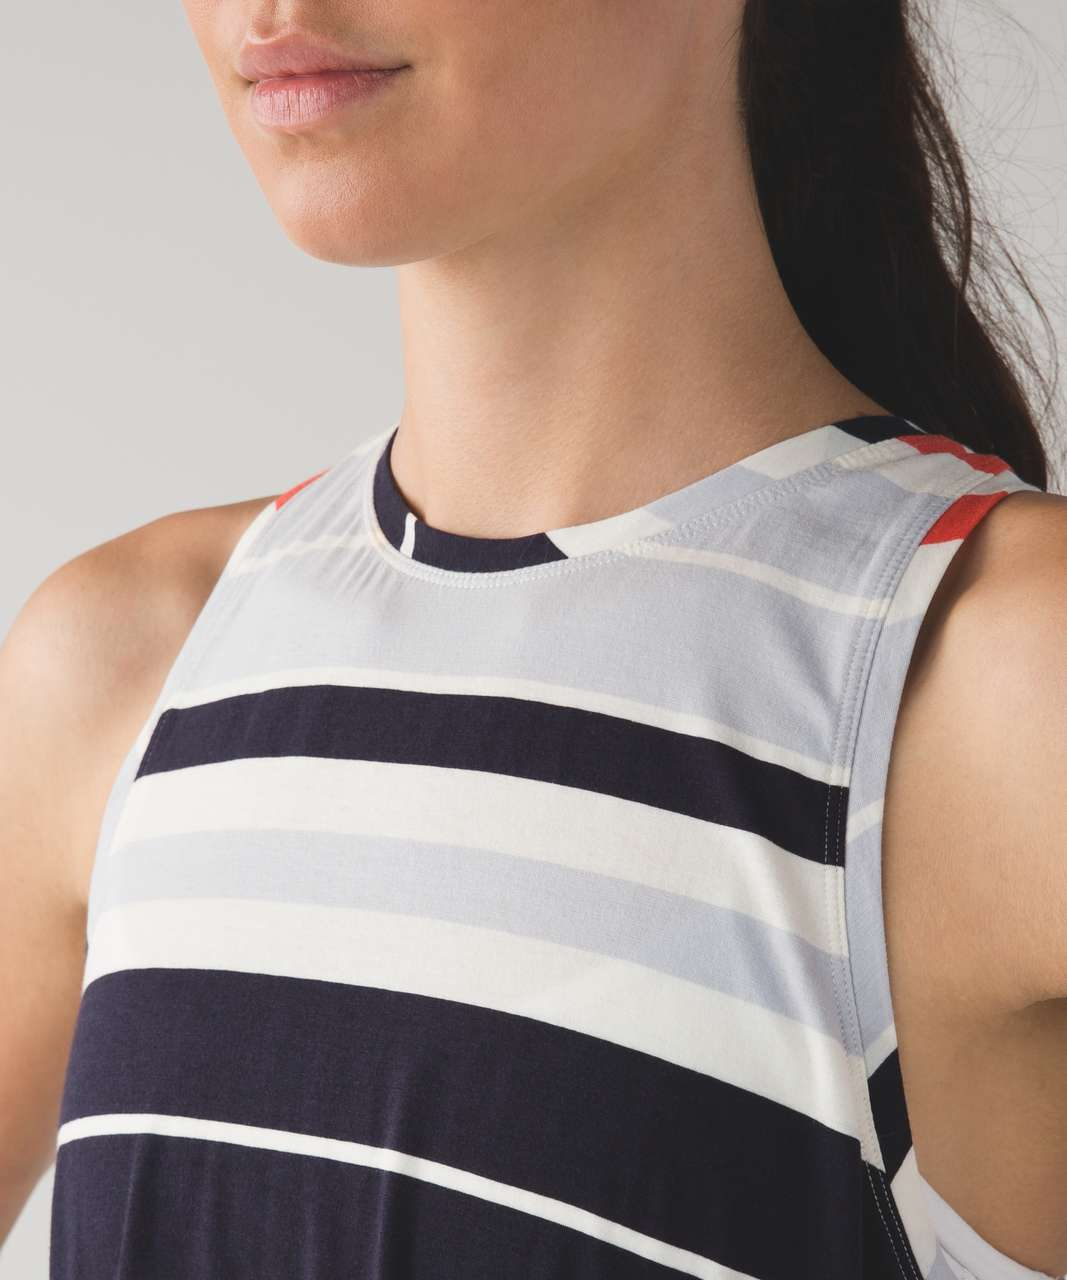 Lululemon All Tied Up Tank - Beach Blanket Stripe Alarming Naval Blue